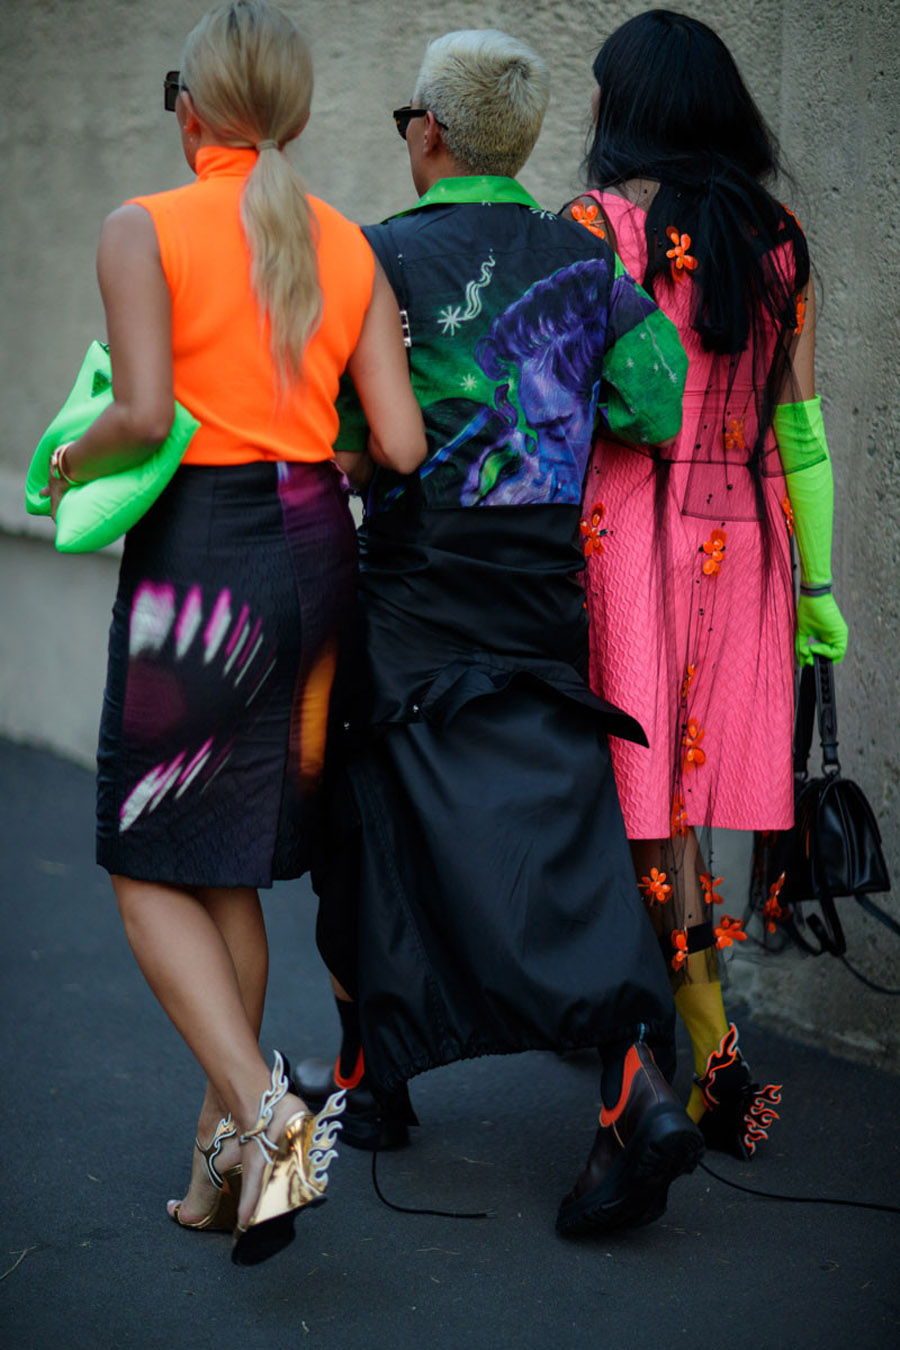 prada-street-style-Neon-and-Nylon-for-Days-at-Prada's-SS19-Show-20